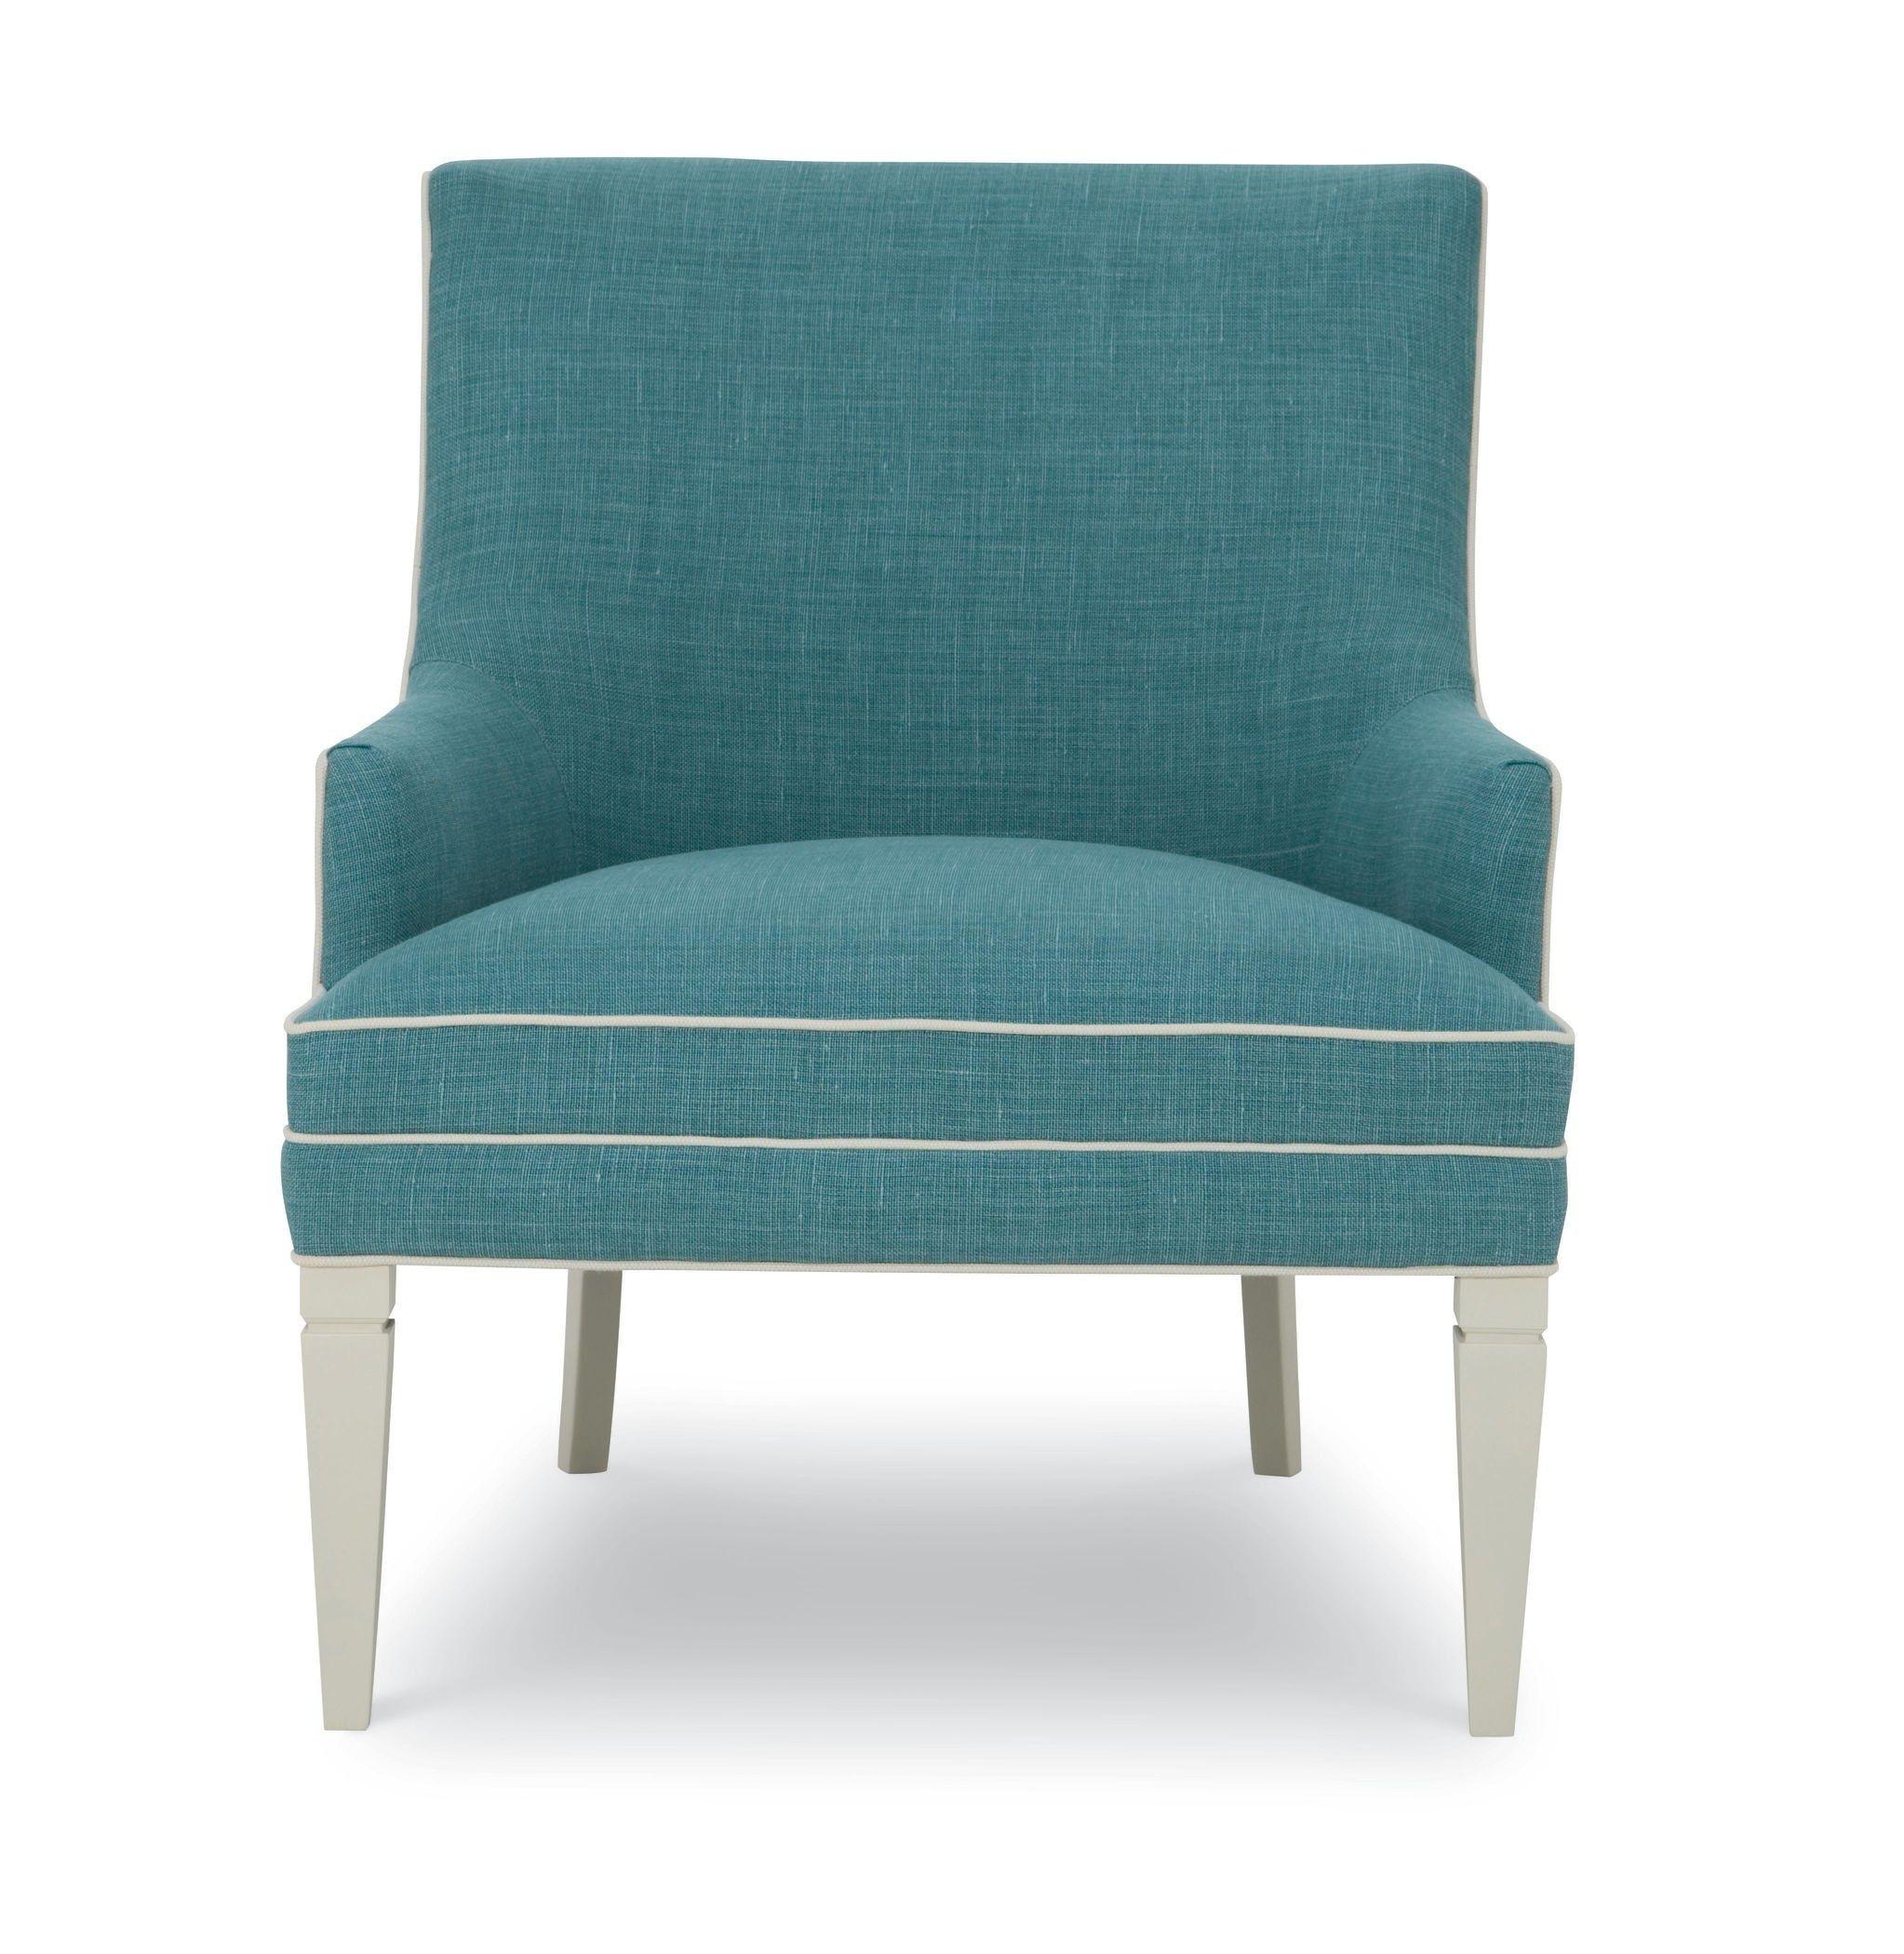 CR Laine Thomas Chair 325 & CR Laine Living Room Thomas Chair 325   Hickory Furniture Mart ...